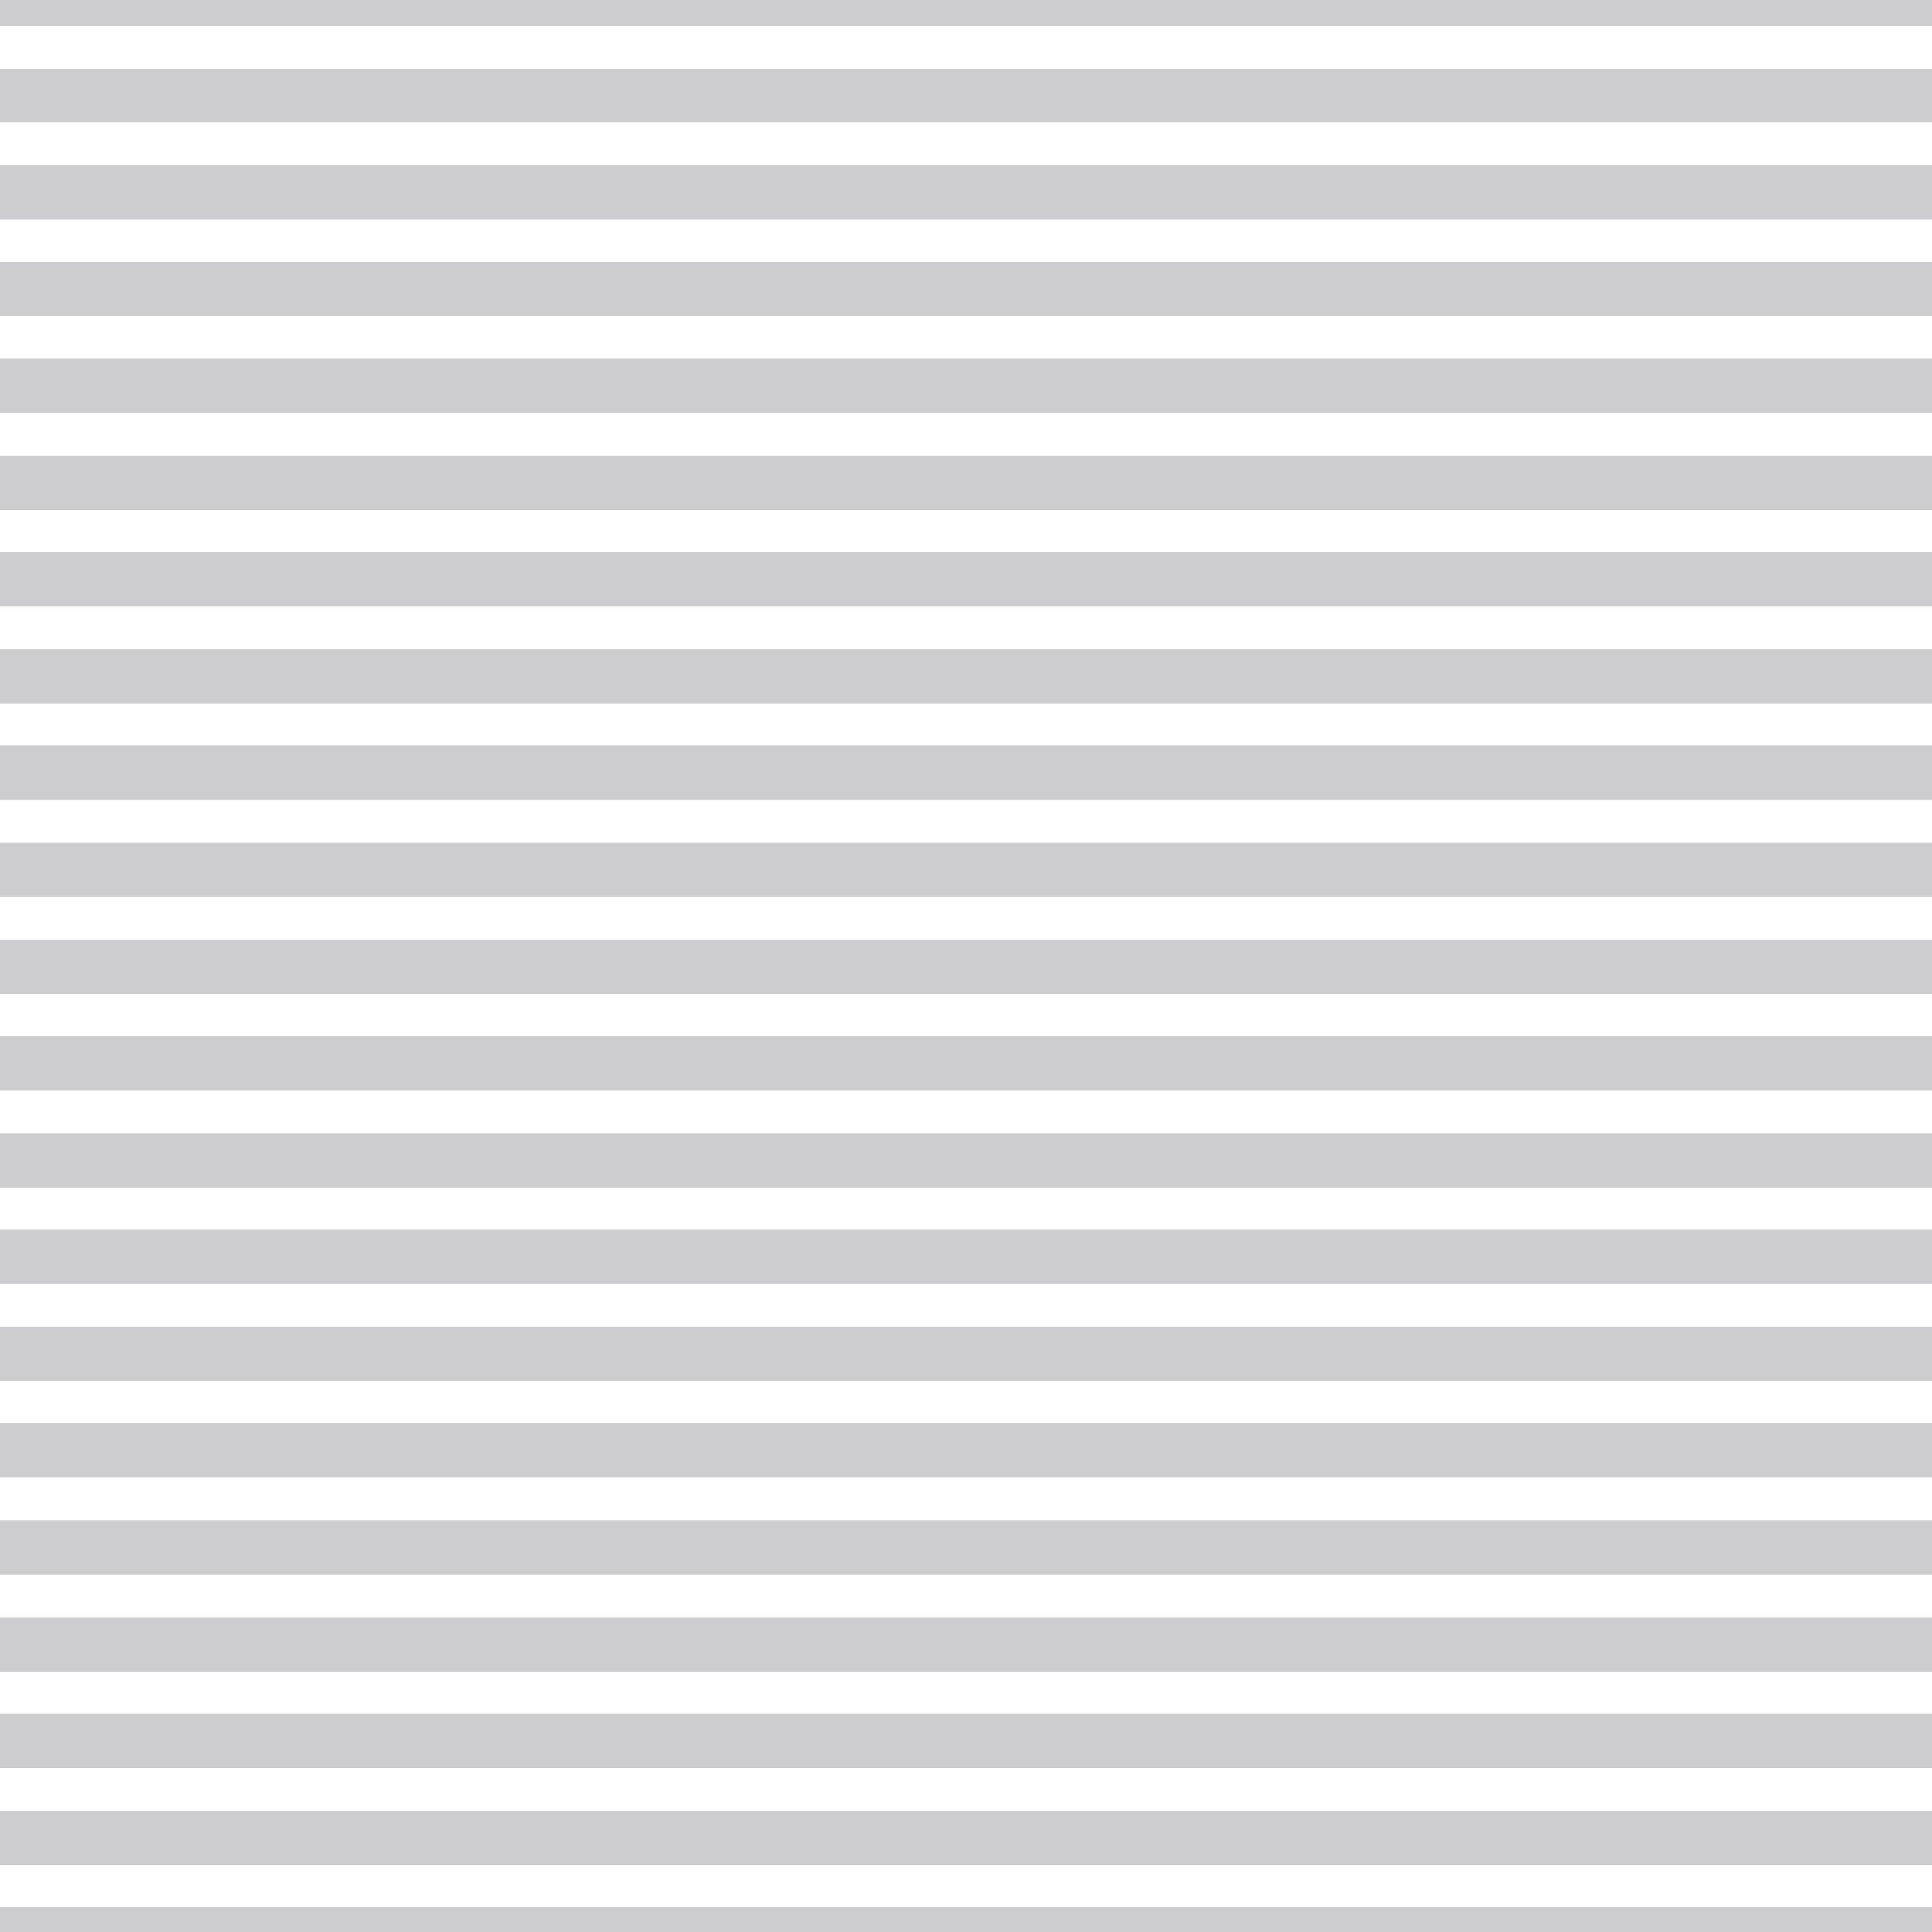 Free Digital Paper Horizontal Stripes Digital Paper Striped